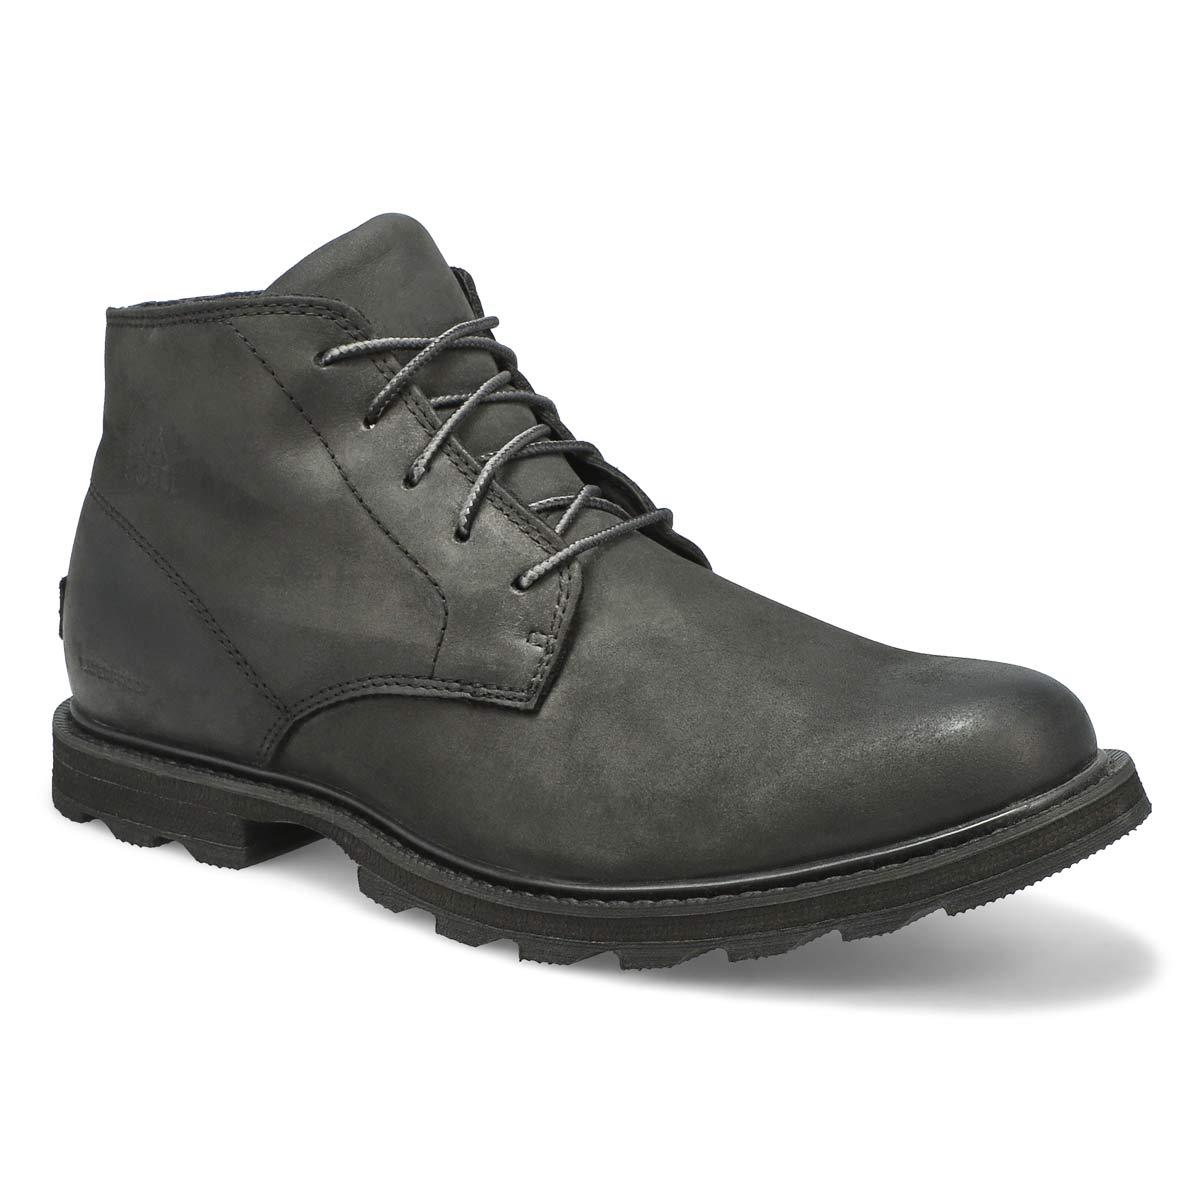 Mns Madson black wtpf chukka boot